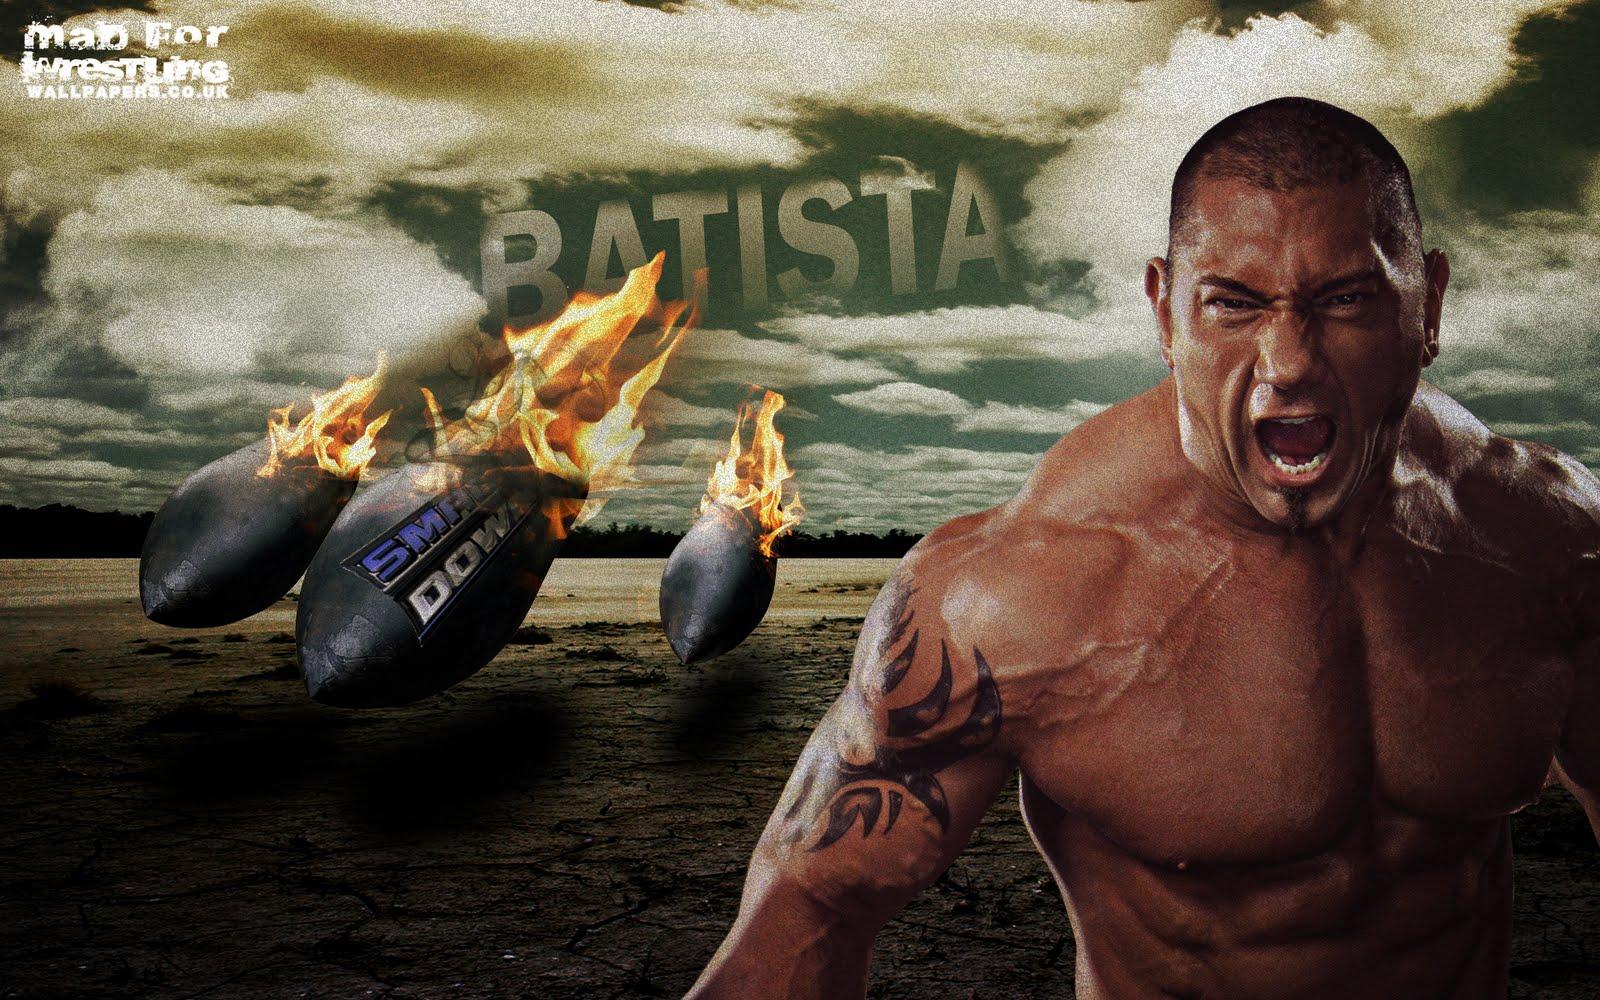 http://4.bp.blogspot.com/-LjL49fZRX7k/TaAeoFTzLGI/AAAAAAAAA8Q/Ncqbr42zhBM/s1600/Batista-Bombs-To-Smackdown-Wallpaper-1920x1200+2.jpg